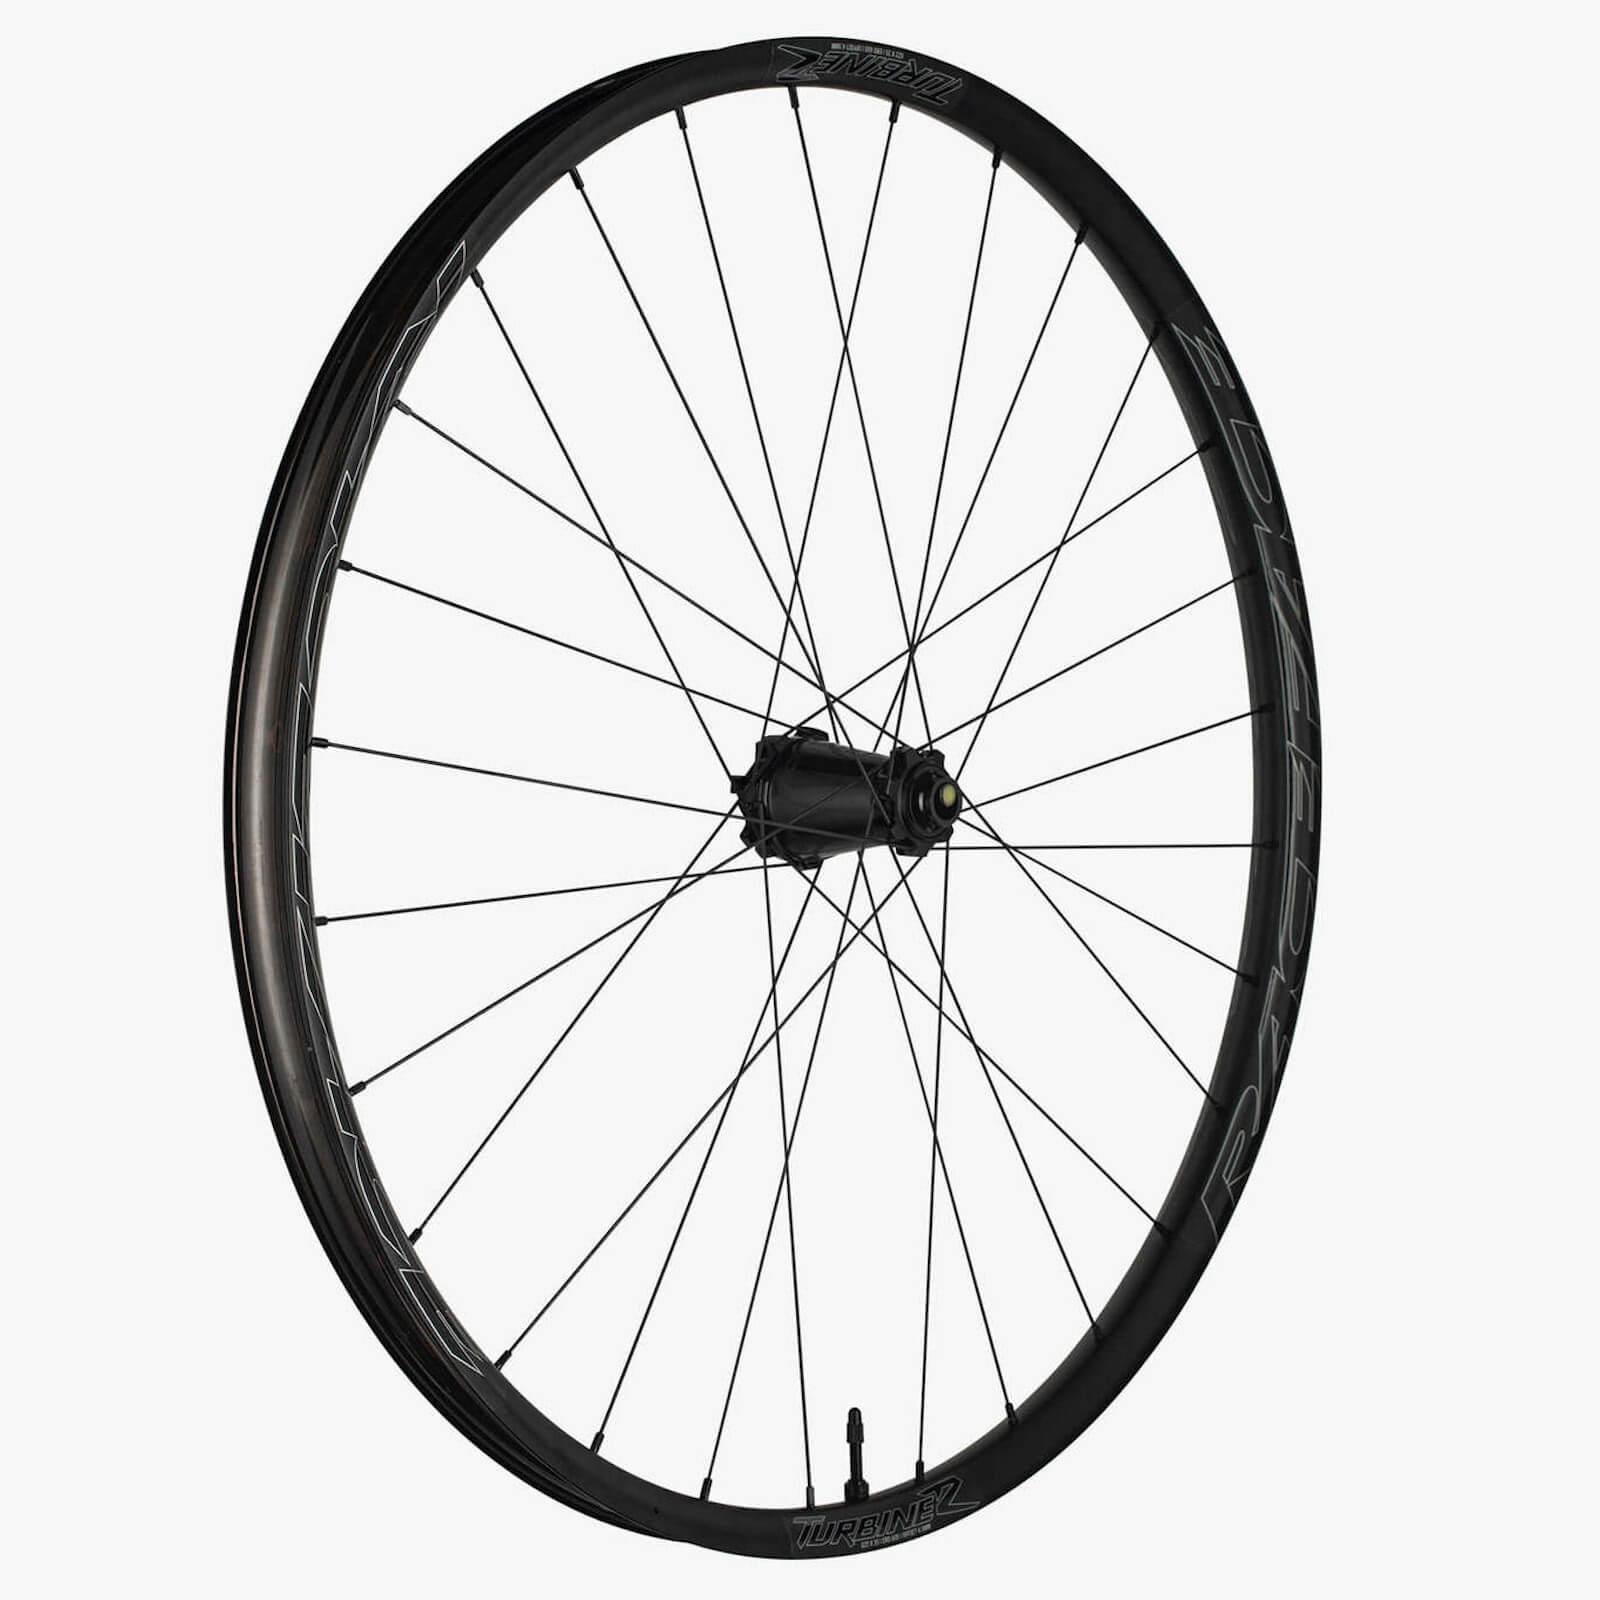 Race Face Turbine R 35mm MTB Alloy Rear Wheel - Black - 27.5 Inch/12 x 157mm - Shimano